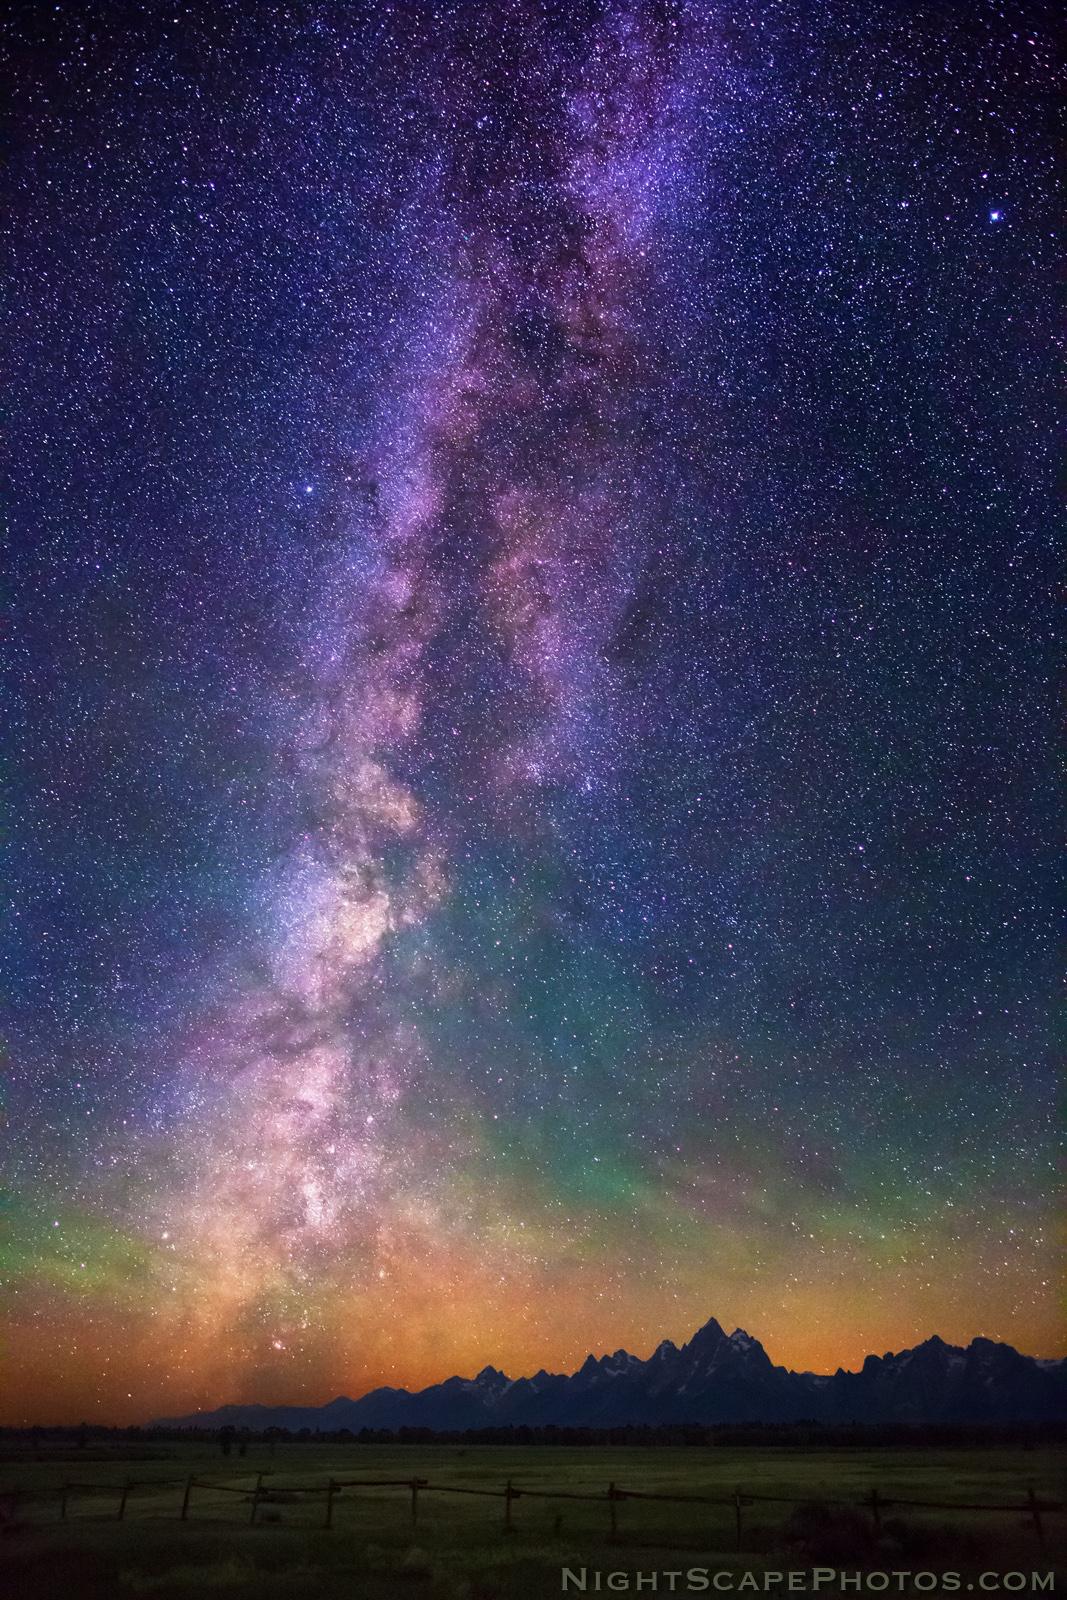 Into The Night Photography Royce Bair S 2016 Photography